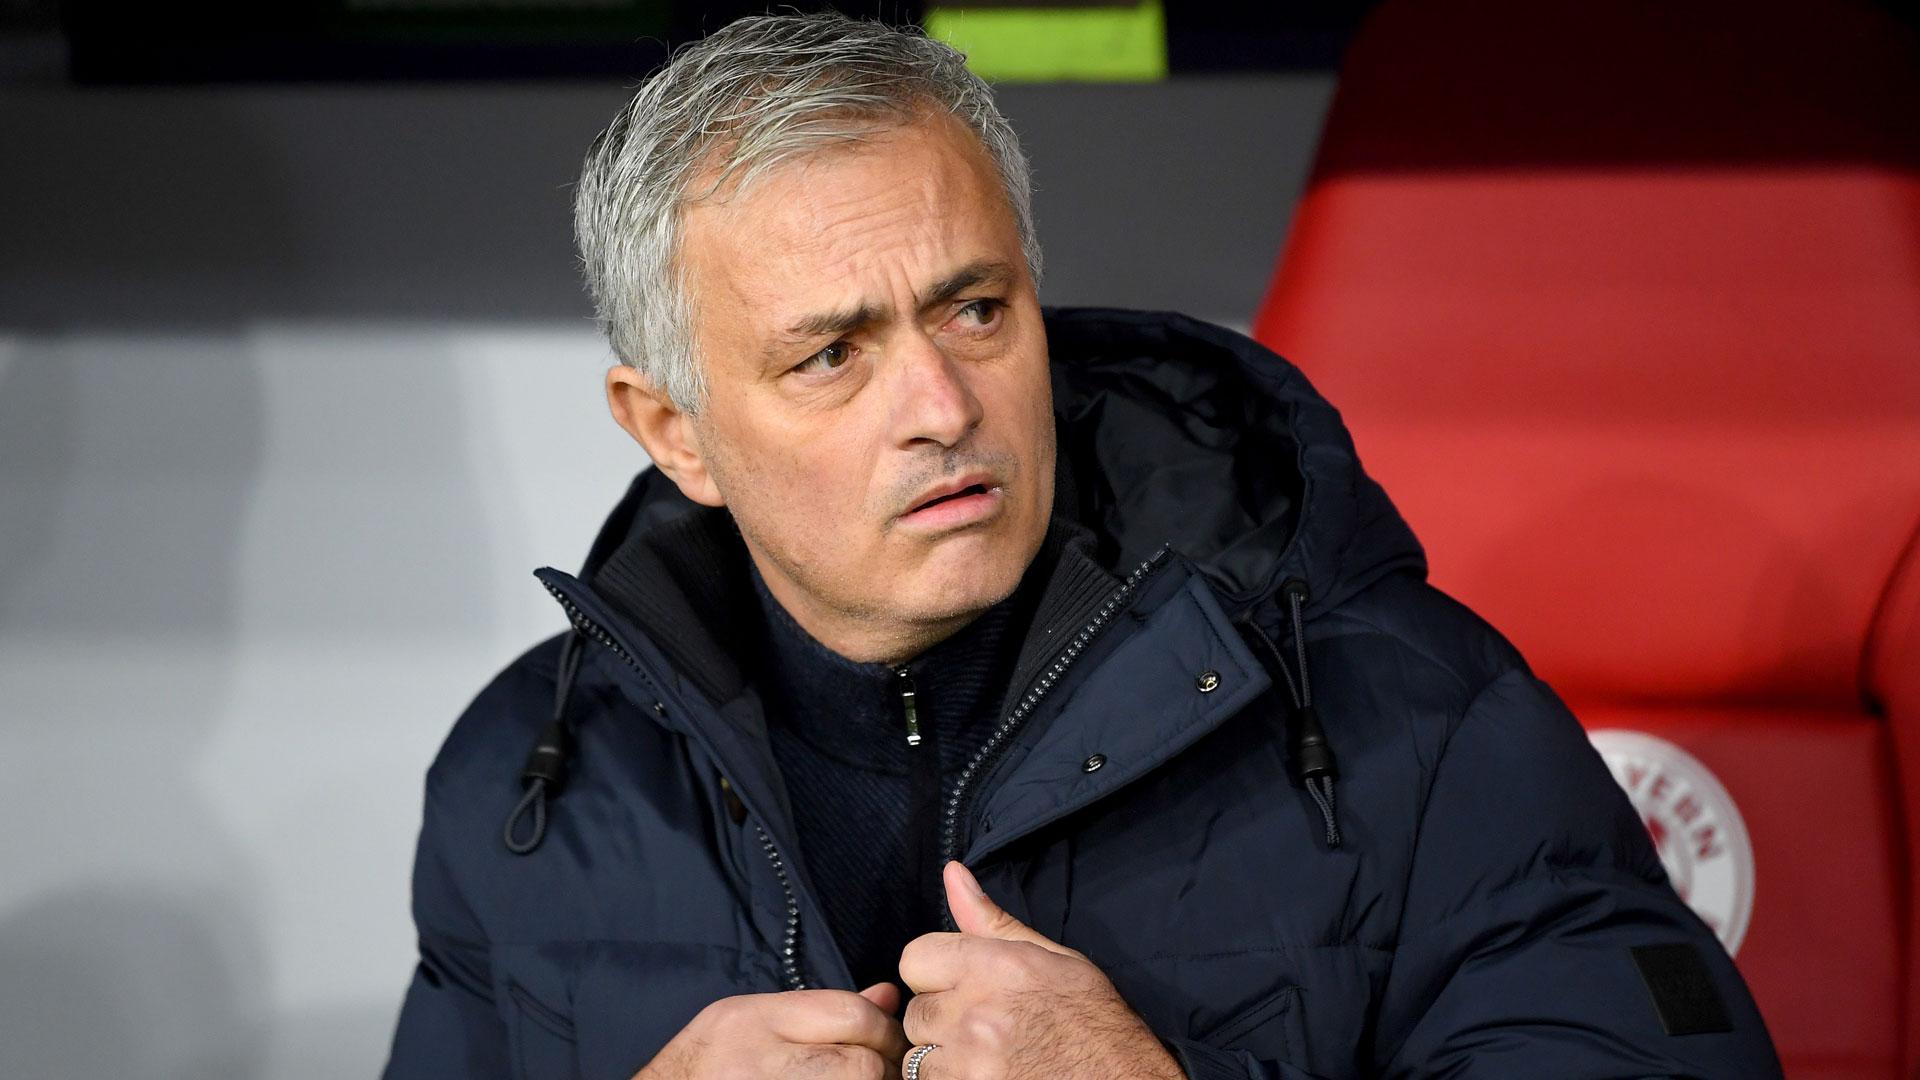 Mourinho encourages Vertonghen, Eriksen to stay at Spurs